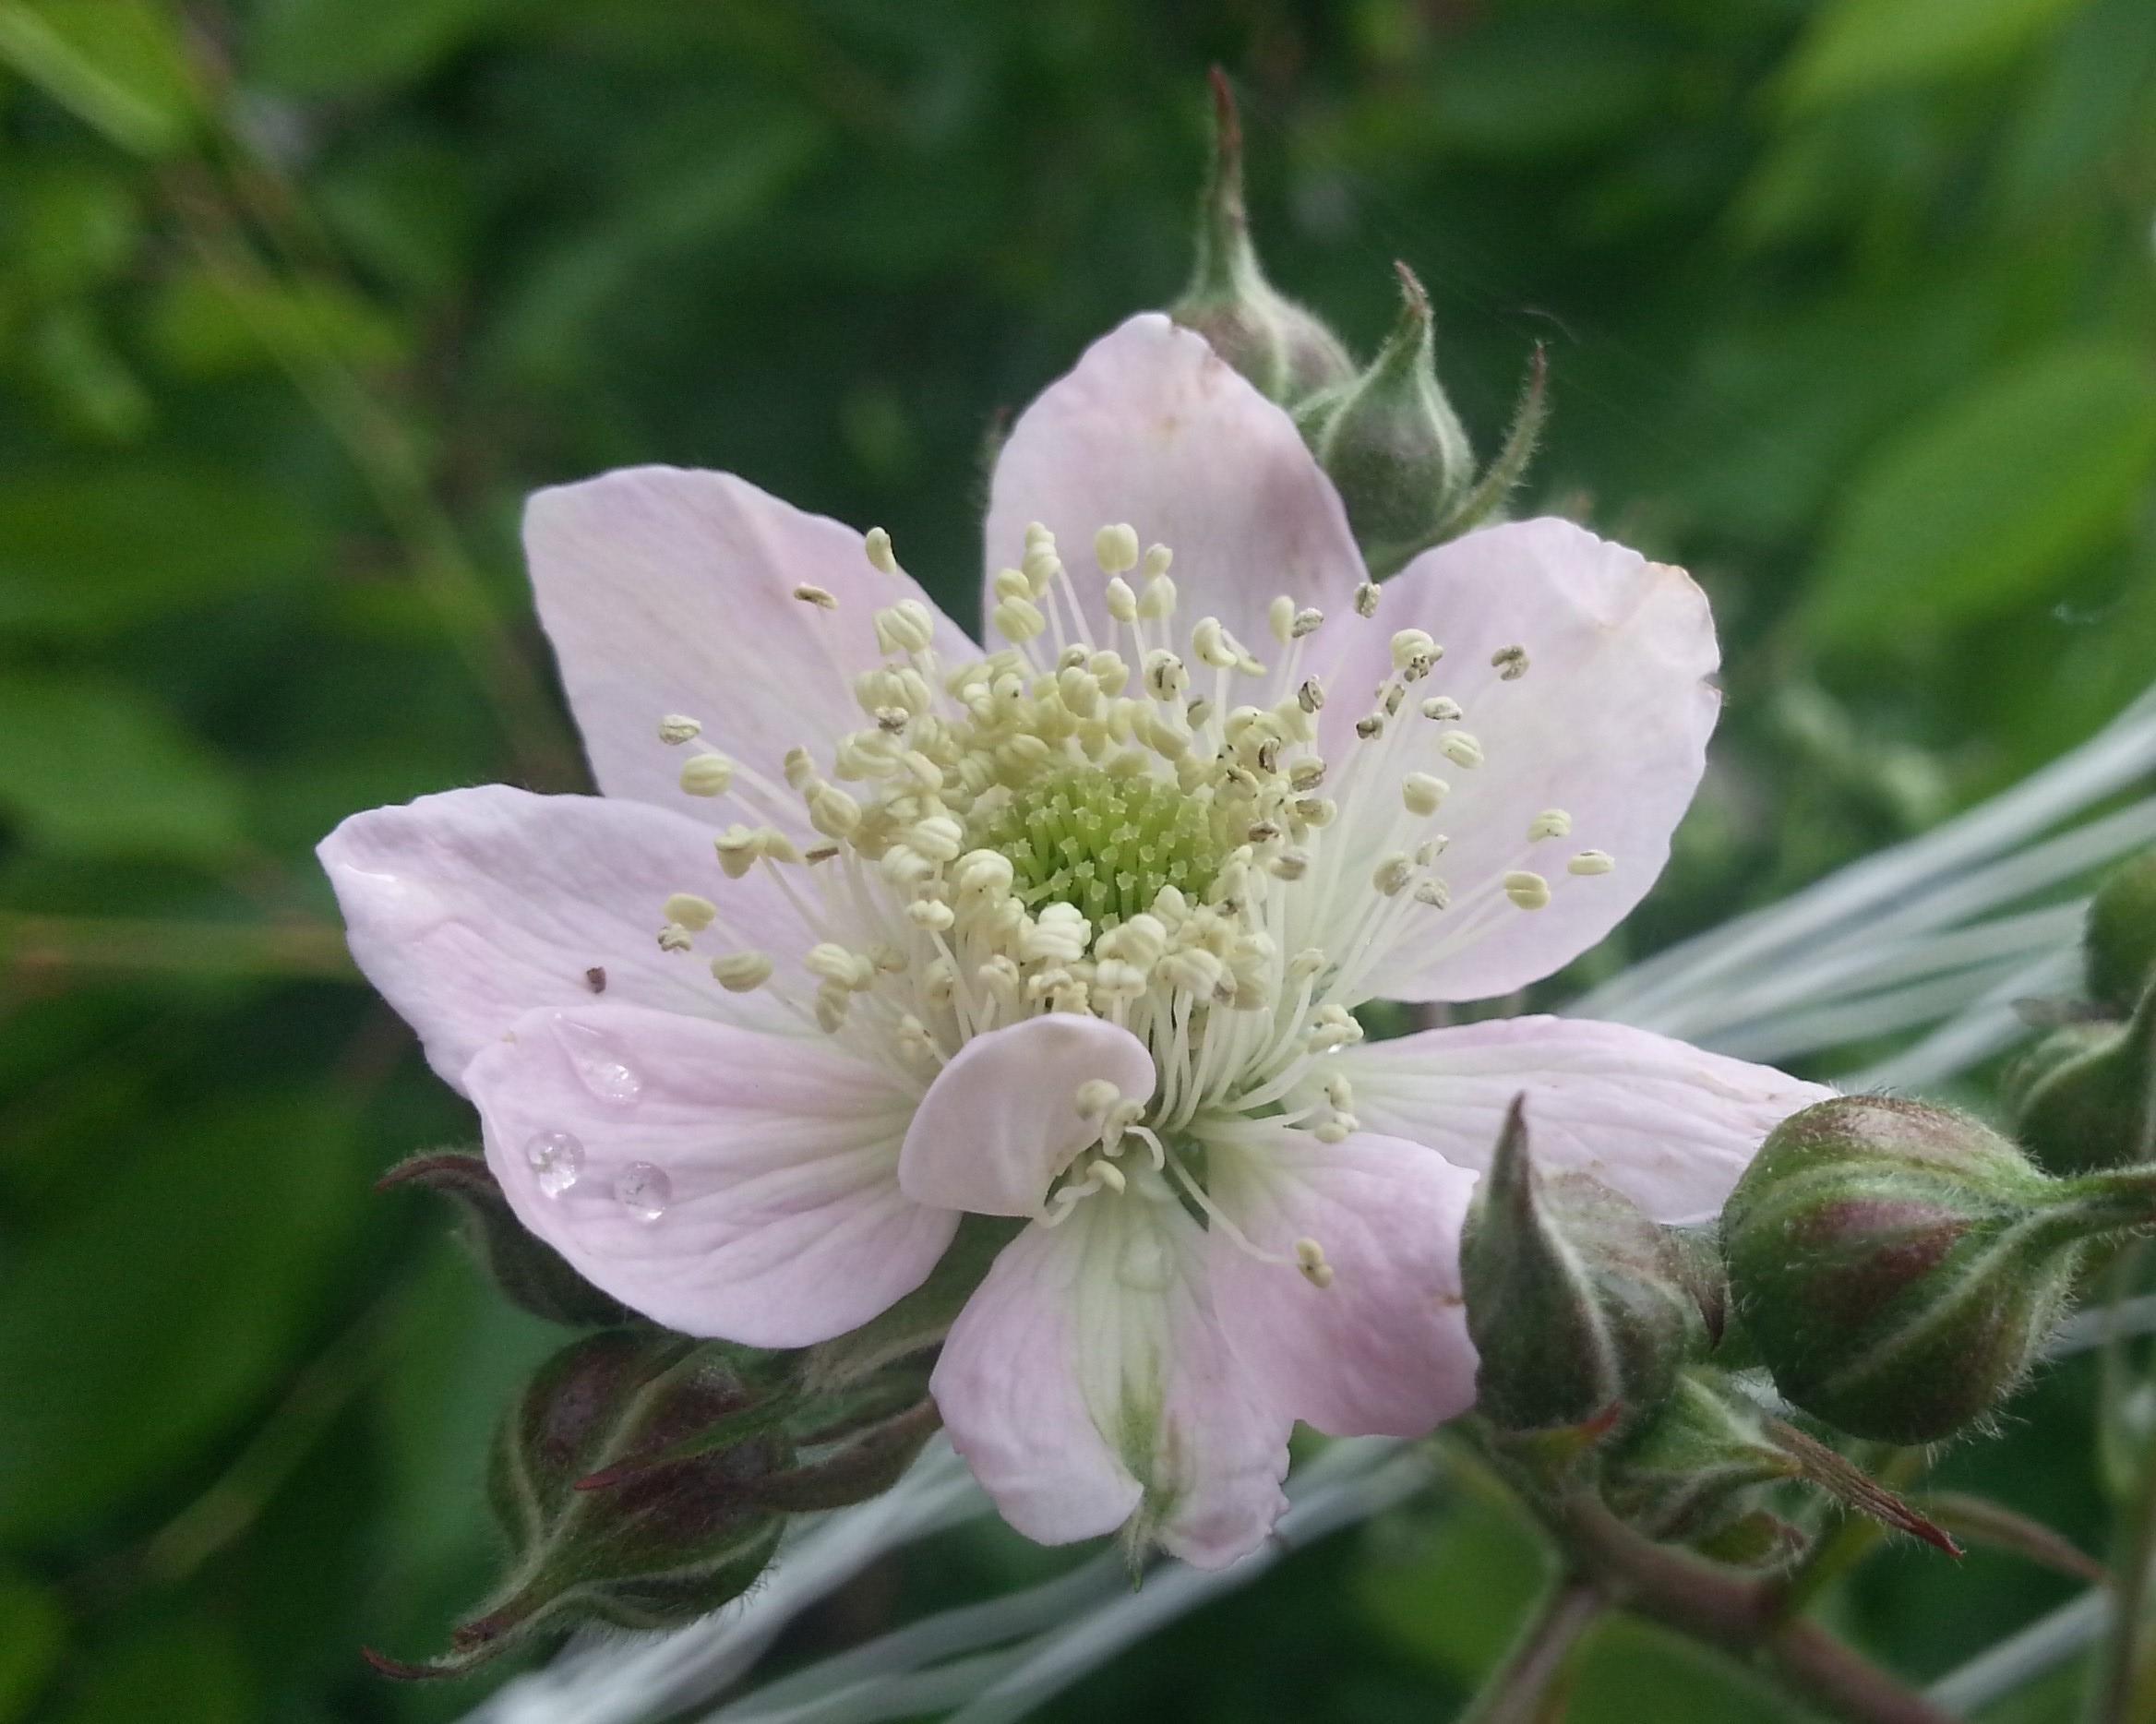 ropliquidaindroponblackberrypalepinkflower